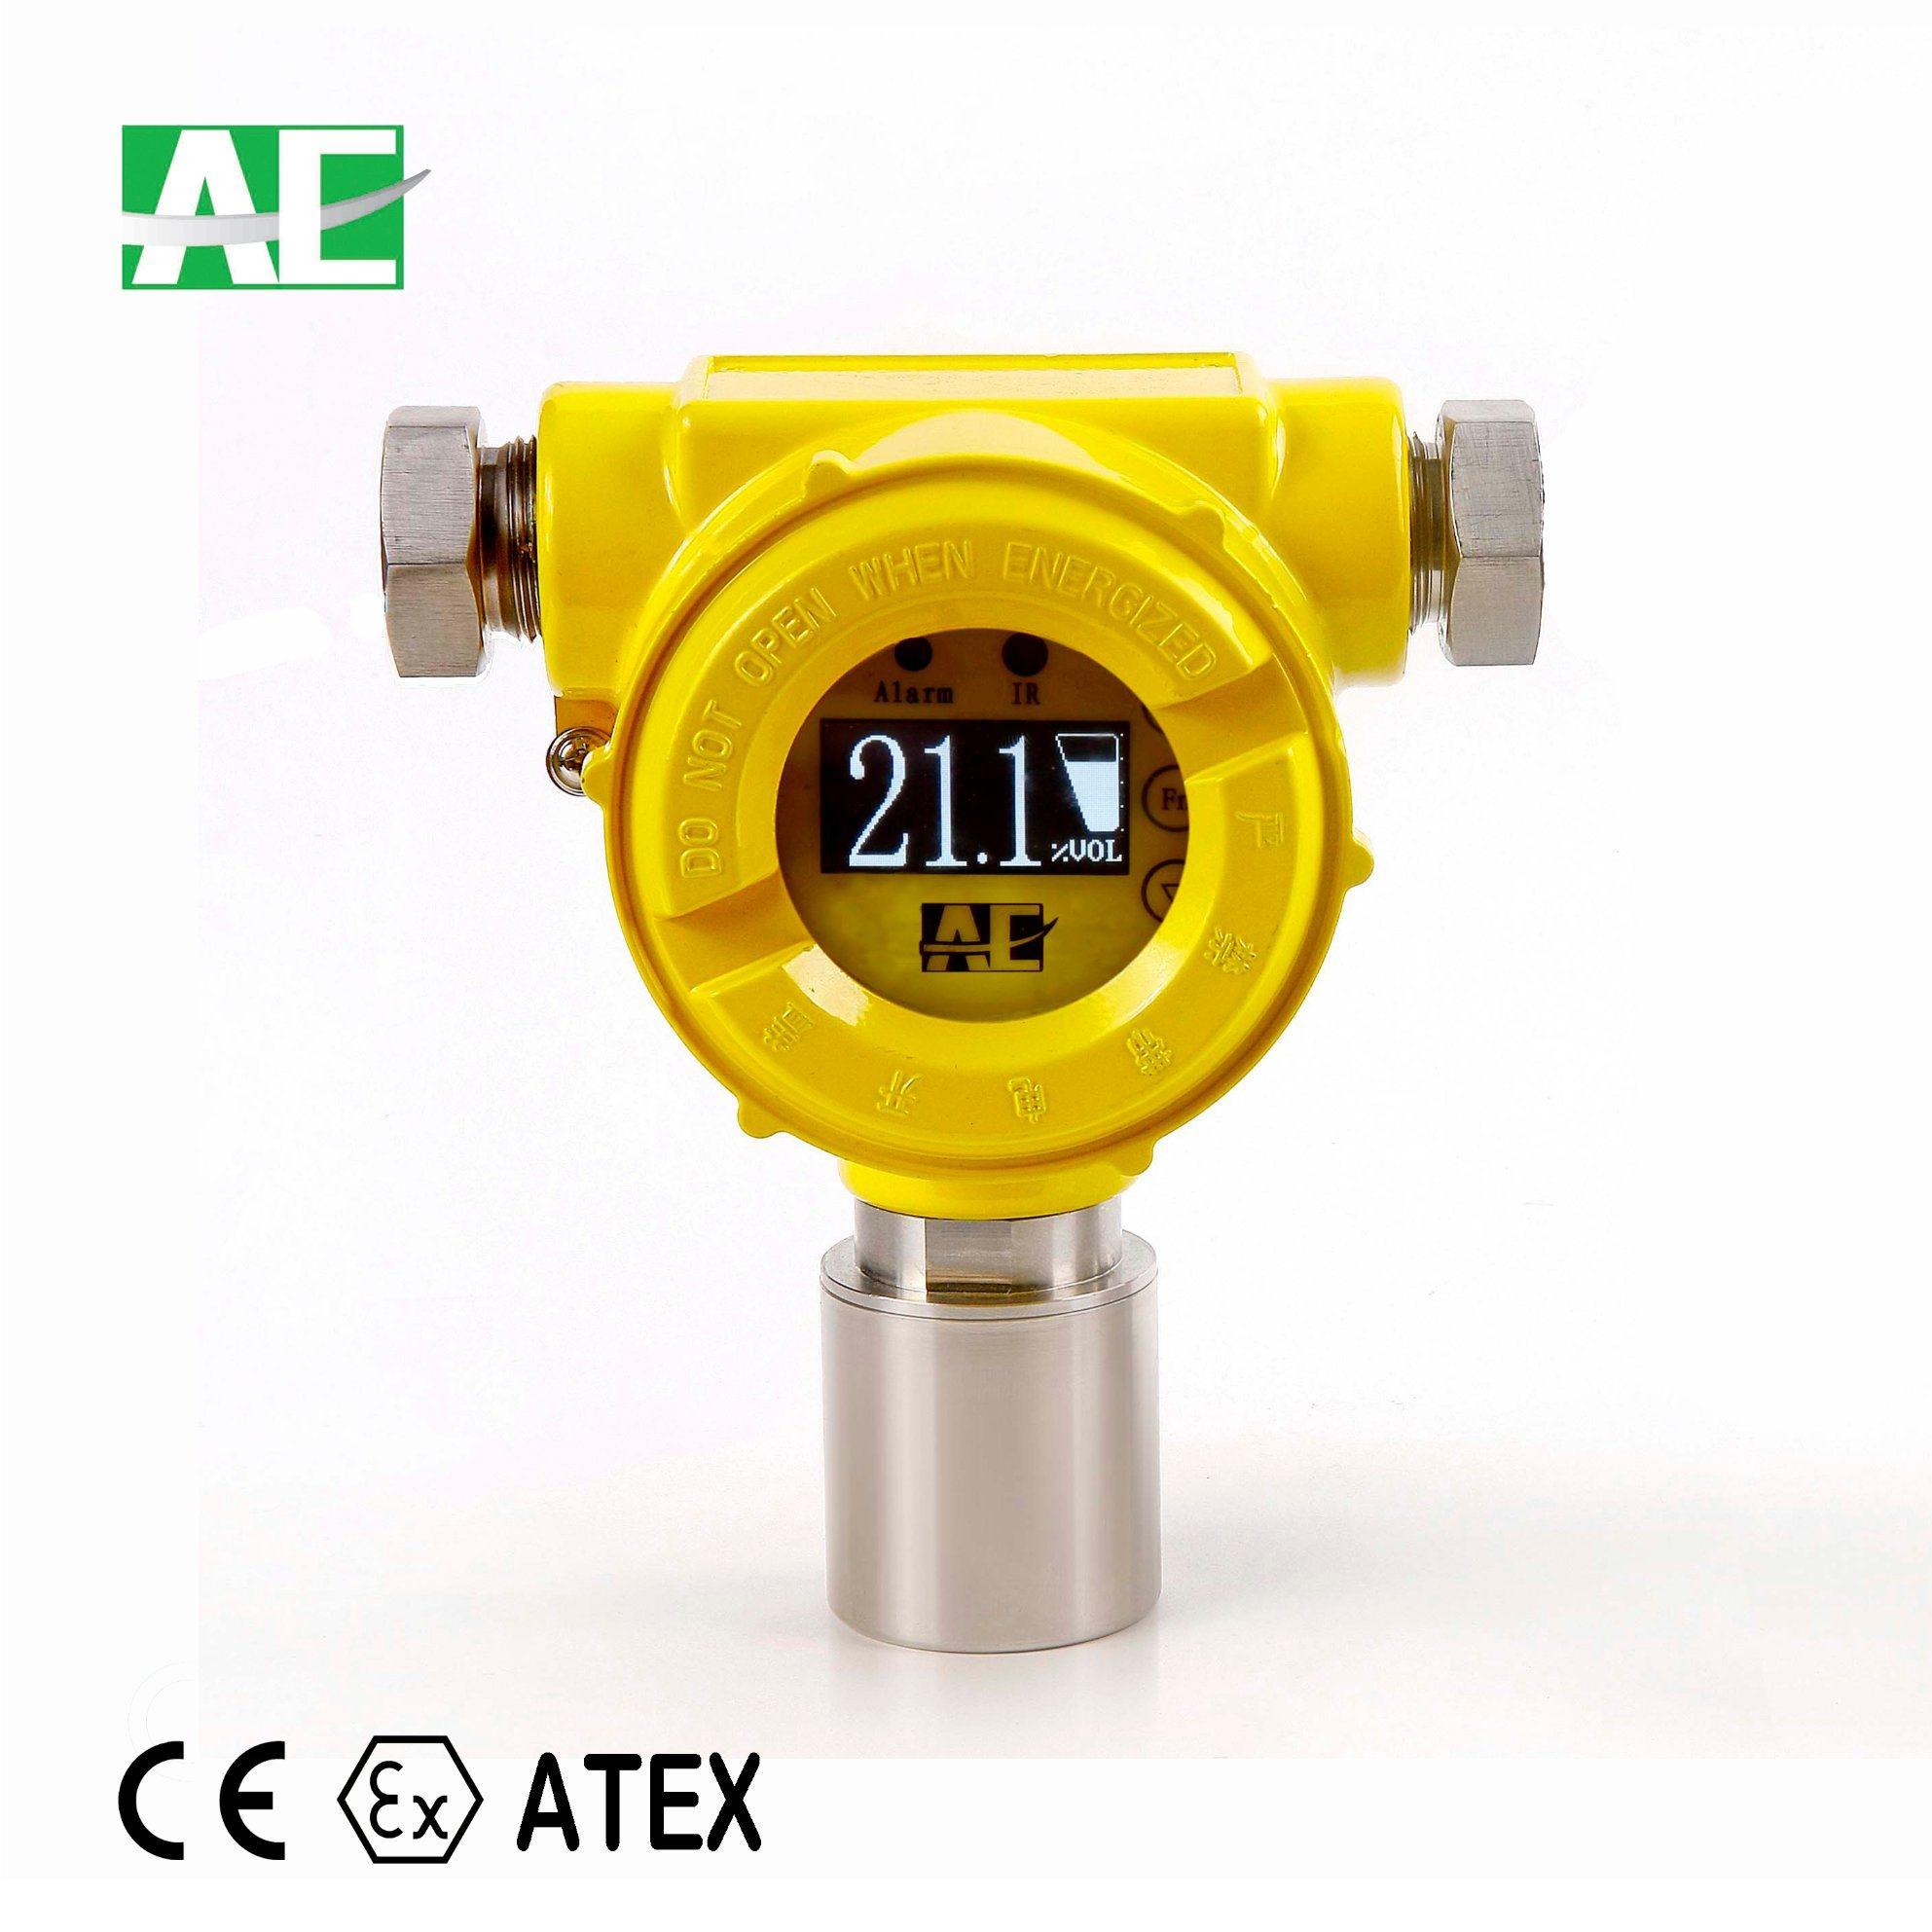 [Hot Item] Fixed Methane Ethane Propane Butane Gas Leak Detector